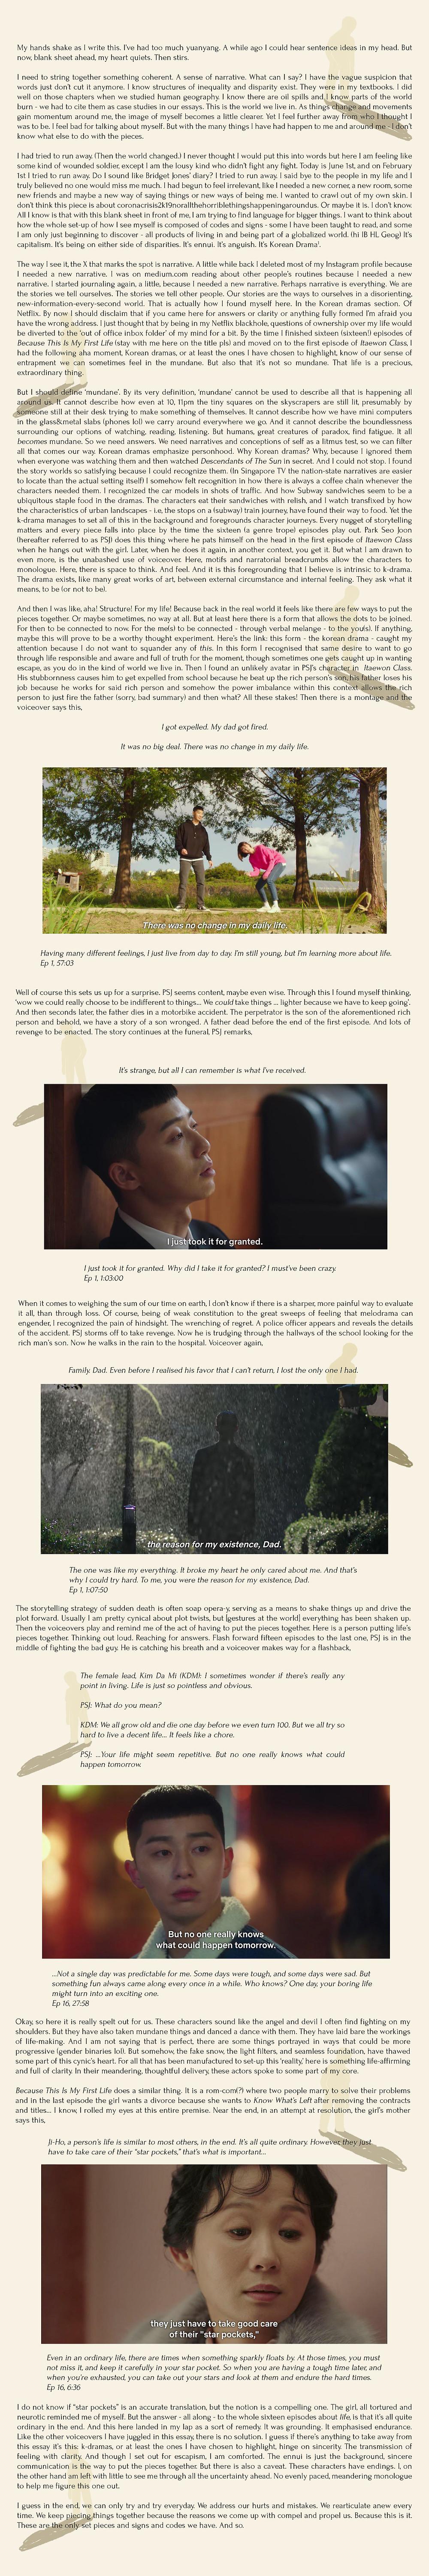 blurb magazine. blurbmag. Its just a (K) Wave korean drama. Audrey Teong. Opinion. @blurb.mag